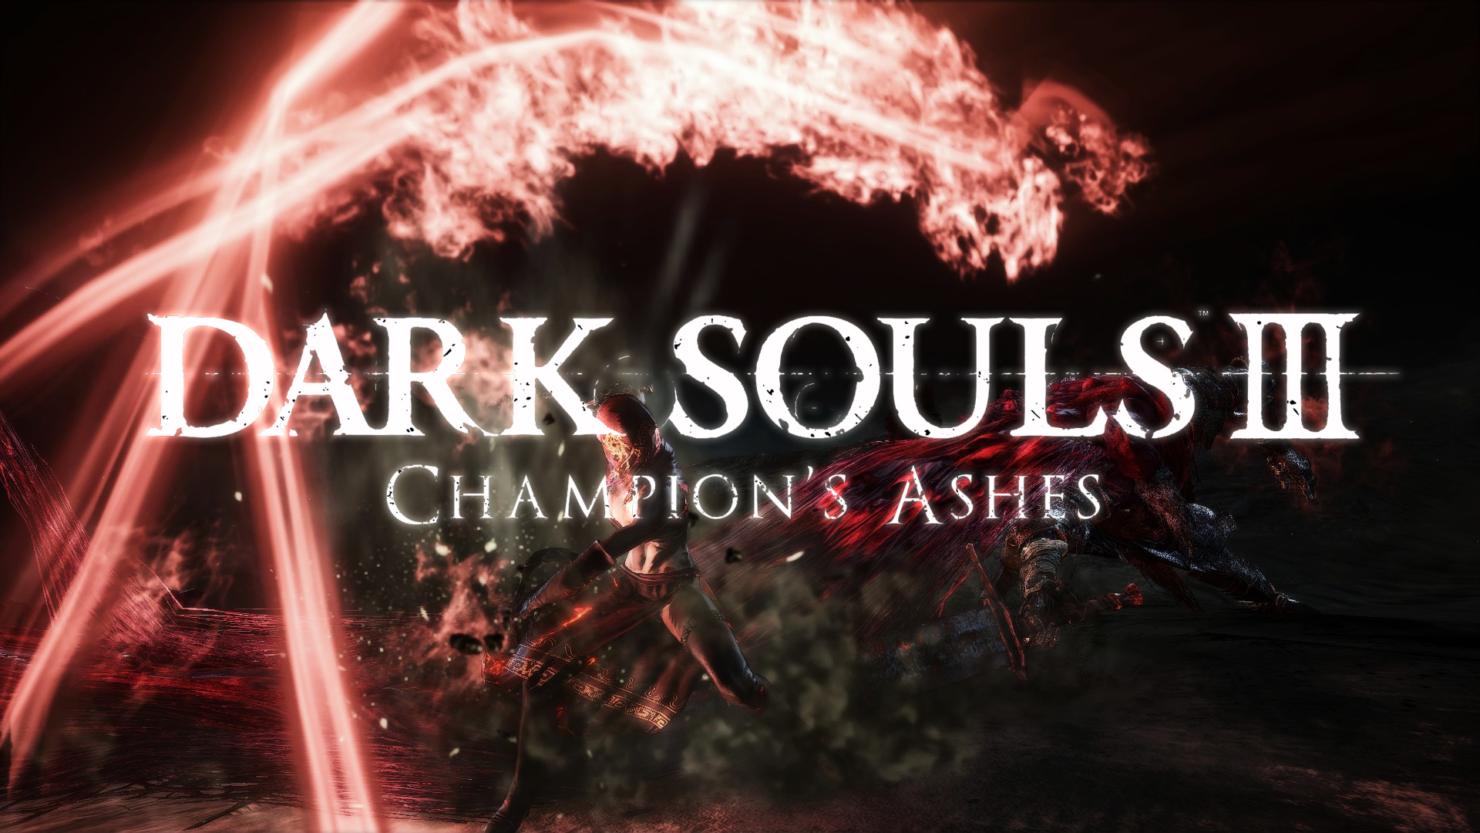 dark souls 3 champions ashes 1